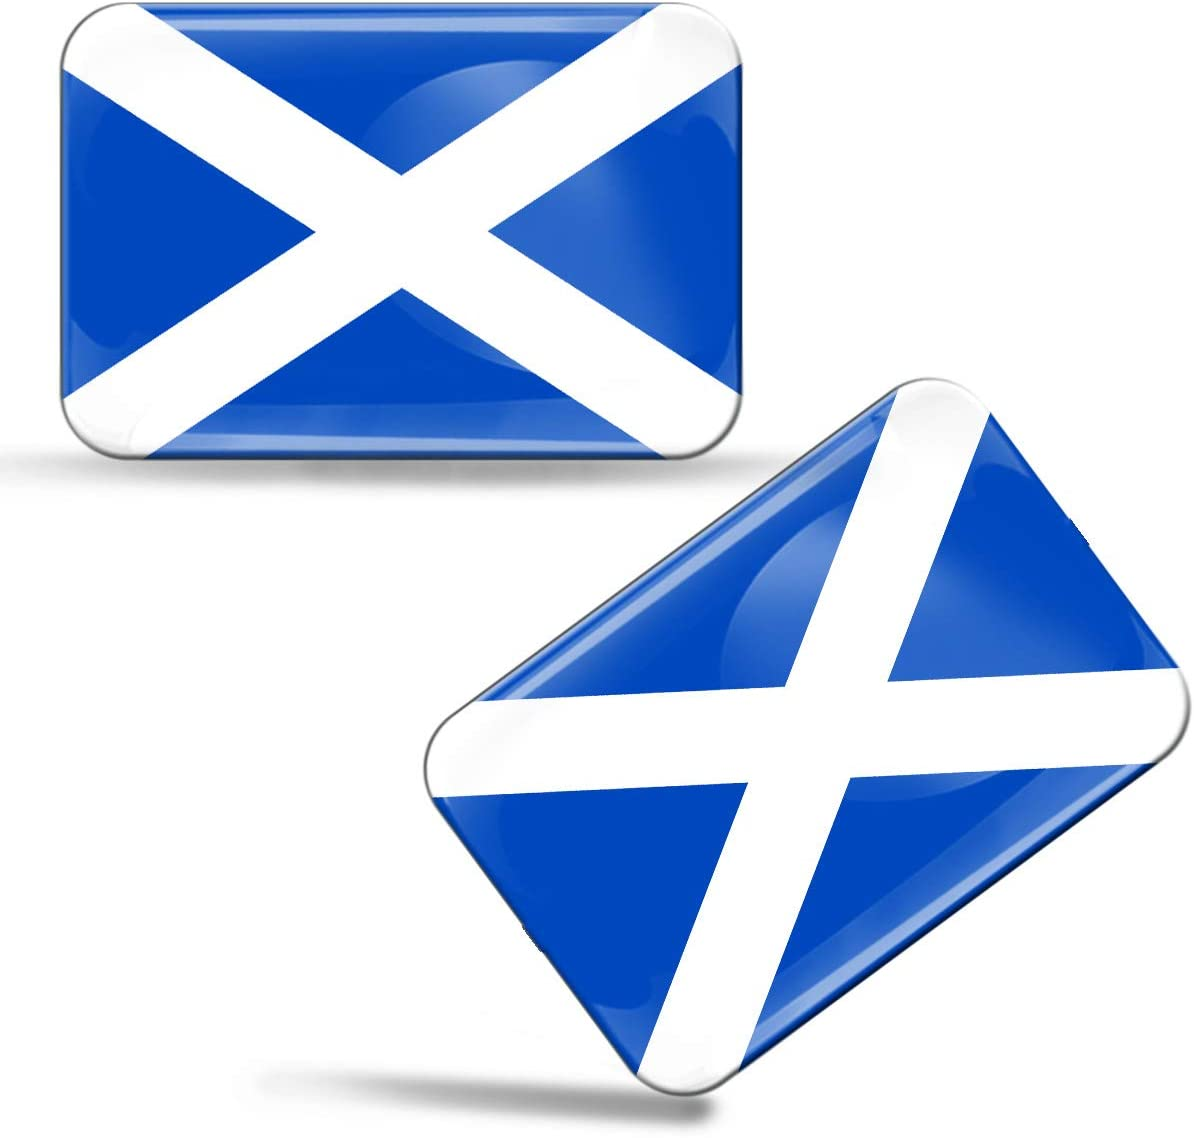 Biomar Labs 2 X Aufkleber 3d Gel Silikon Stickers Schottland Scotland Schottische Flagge Fahne Flag Auto Motorrad Fahrrad Fenster Tür Pc Handy Tablet Laptop F 56 Auto